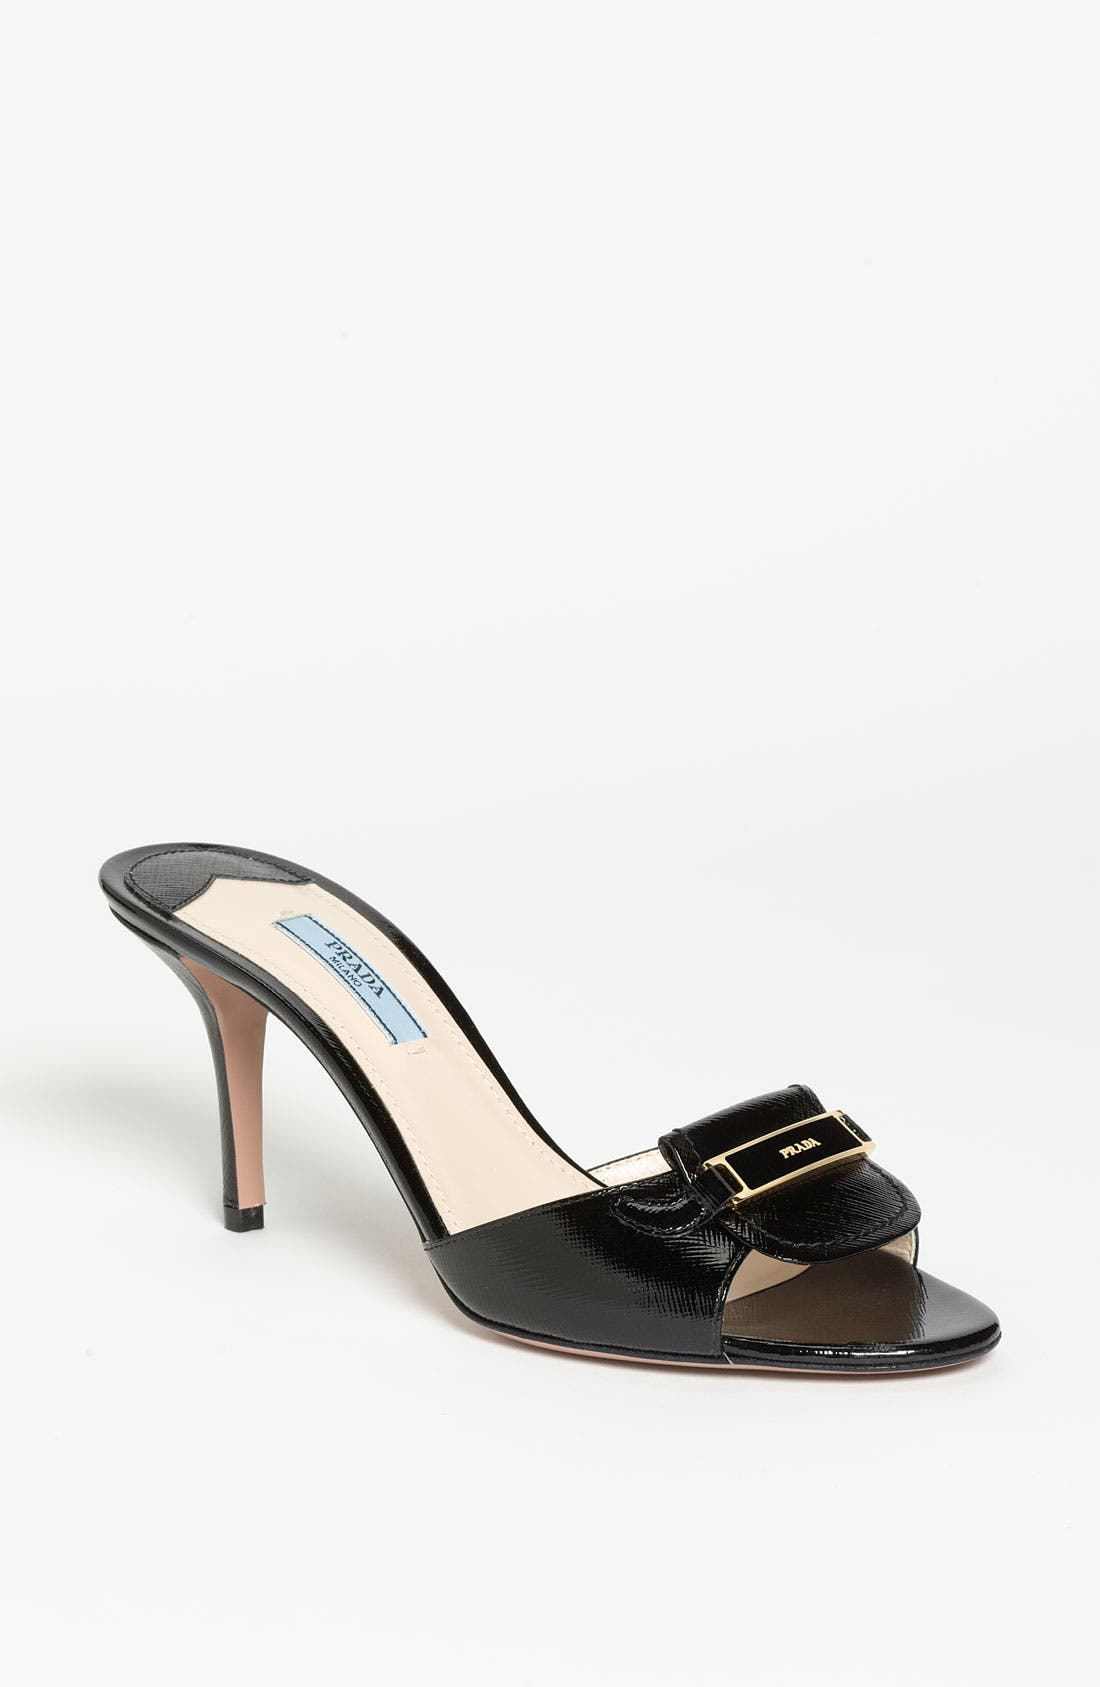 Main Image - Prada Buckle Slide Sandal